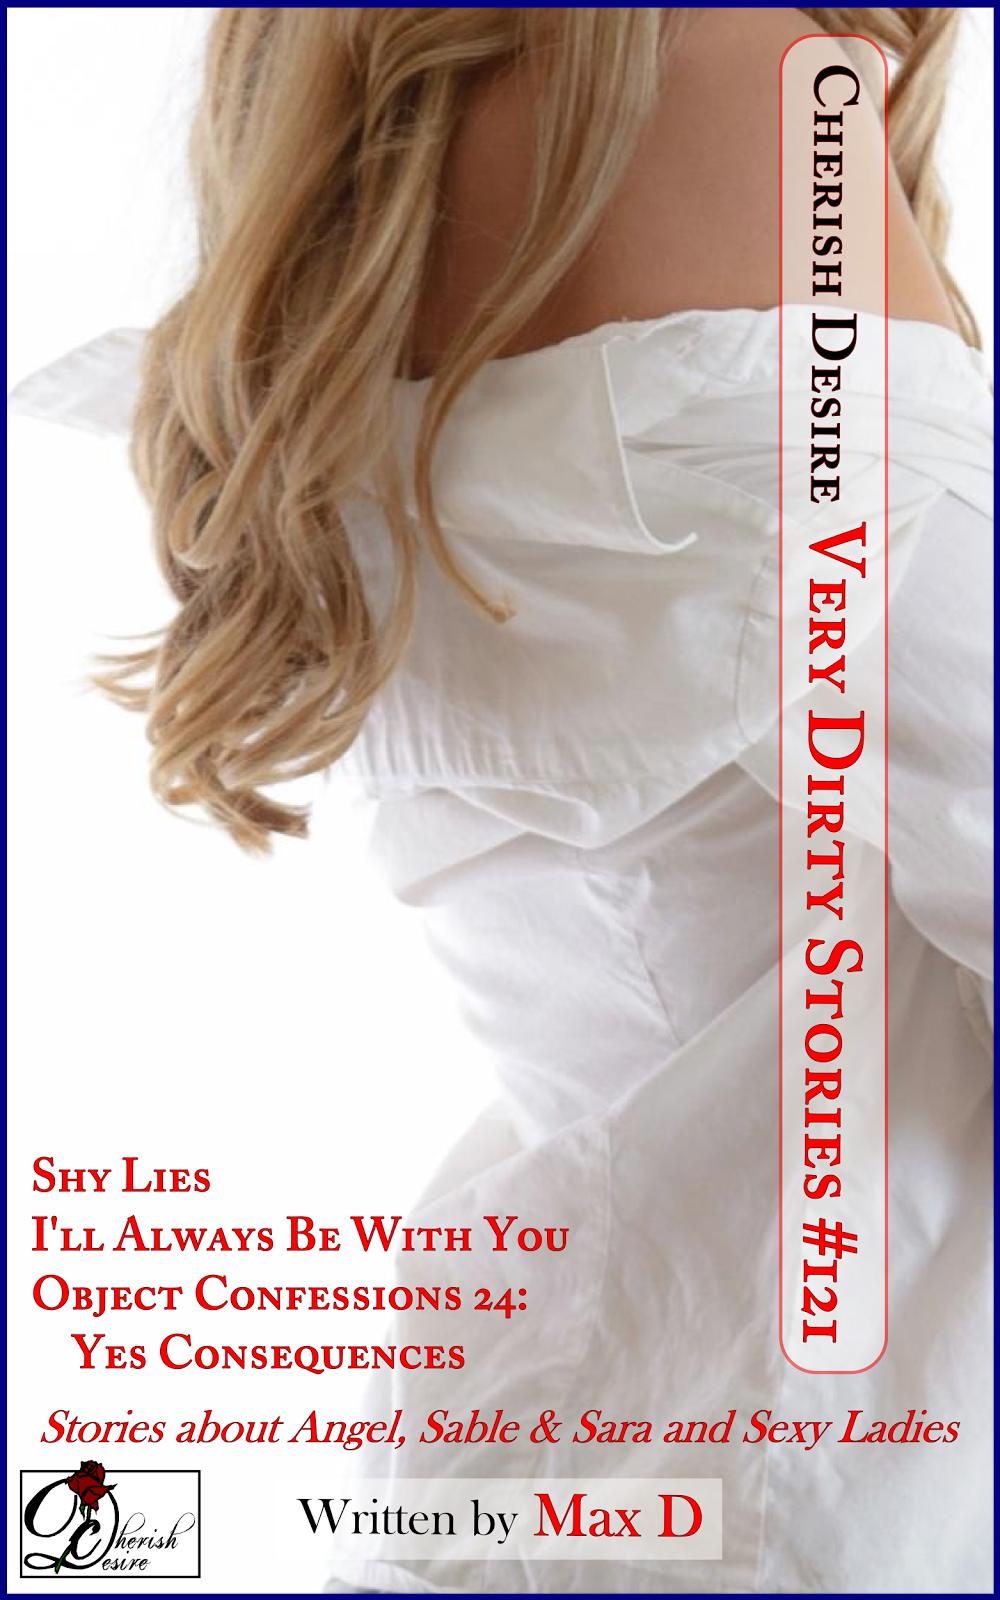 Cherish Desire: Very Dirty Stories #121, Max D, erotica